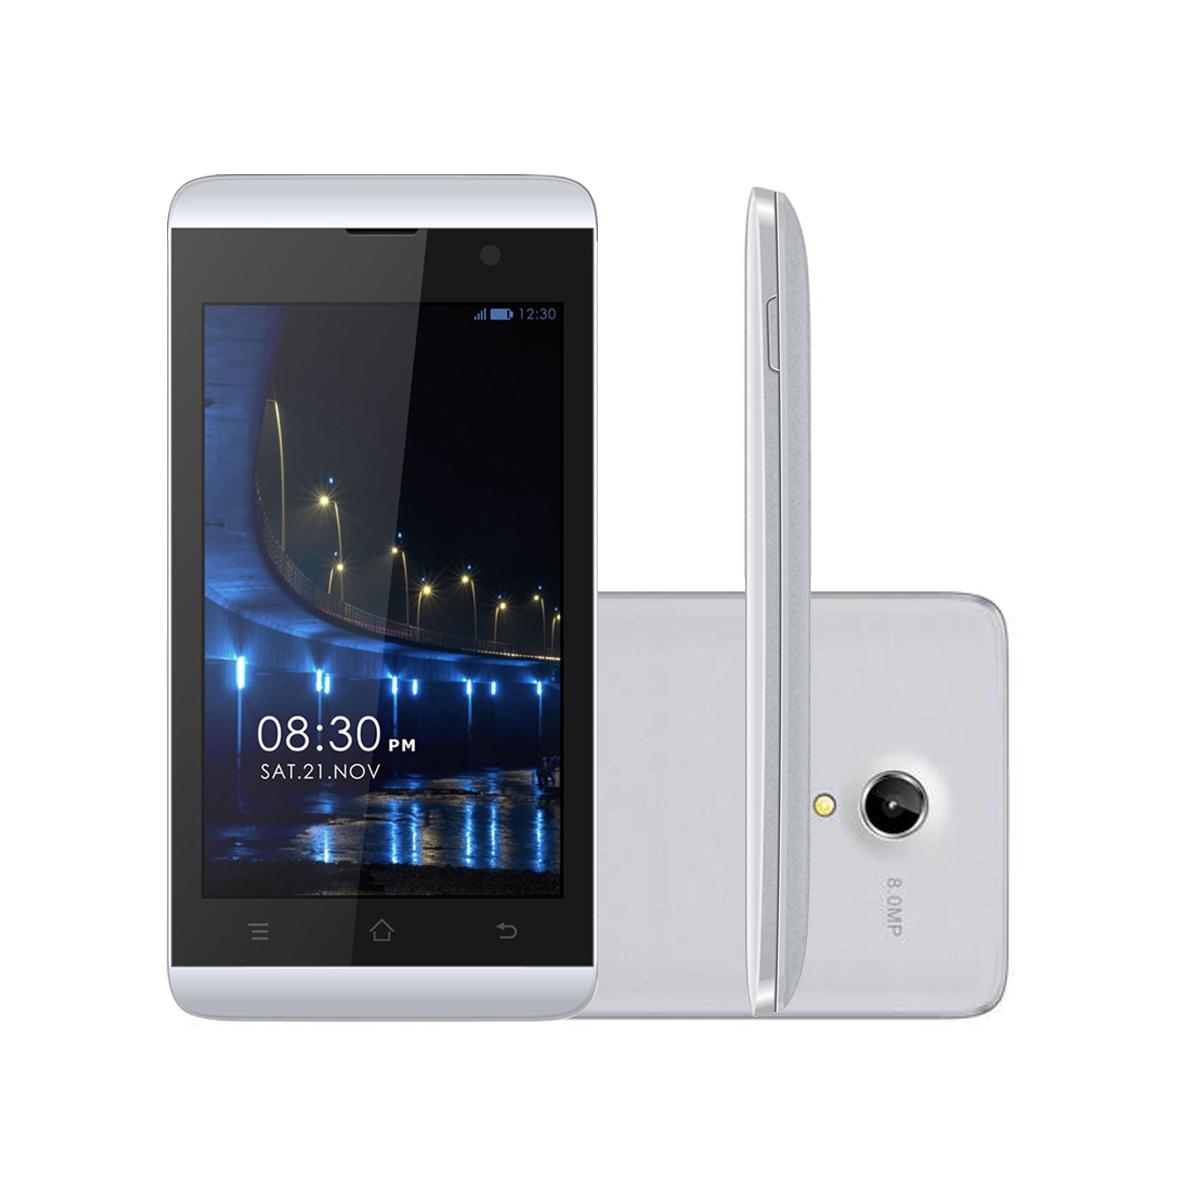 Celular Meu AN400 Dual Tela 4' Redes Sociais Wi-fi 3G (Outlet)